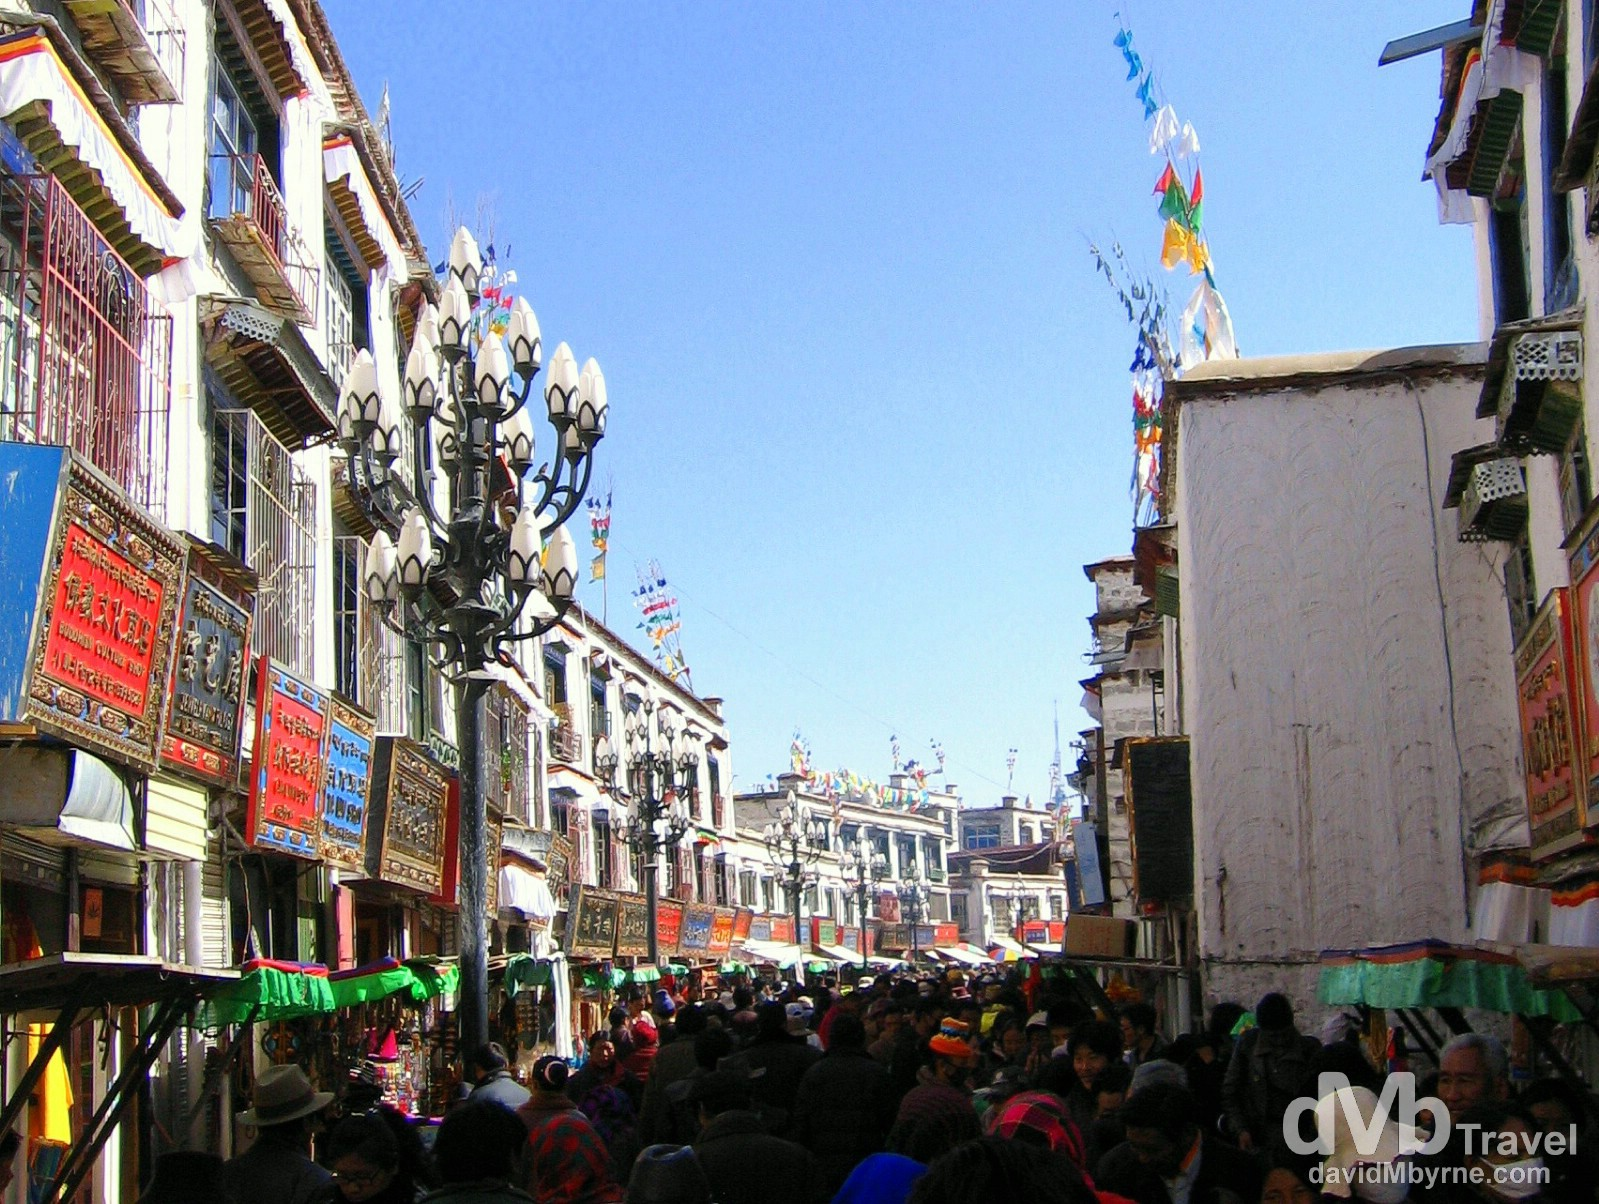 Walking the Barkhor Circuit, Barkhor, Lhasa, Tibet. February 25th, 2008.